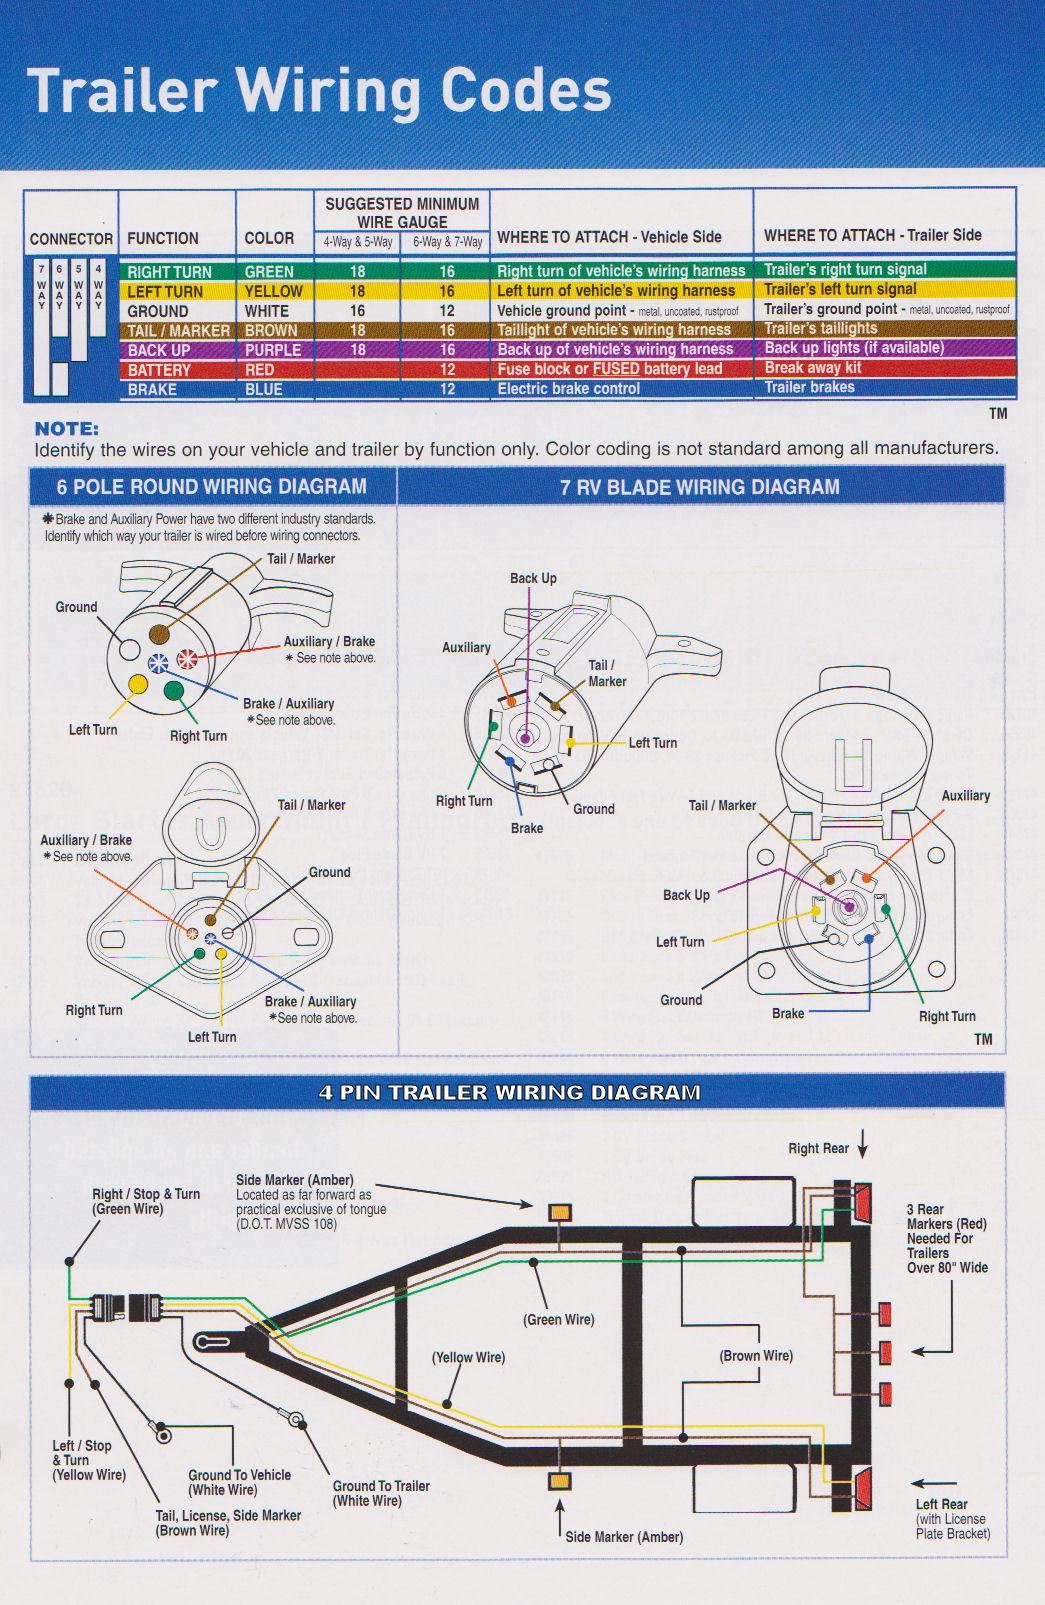 hh cargo trailer wiring diagram wiring diagram general home